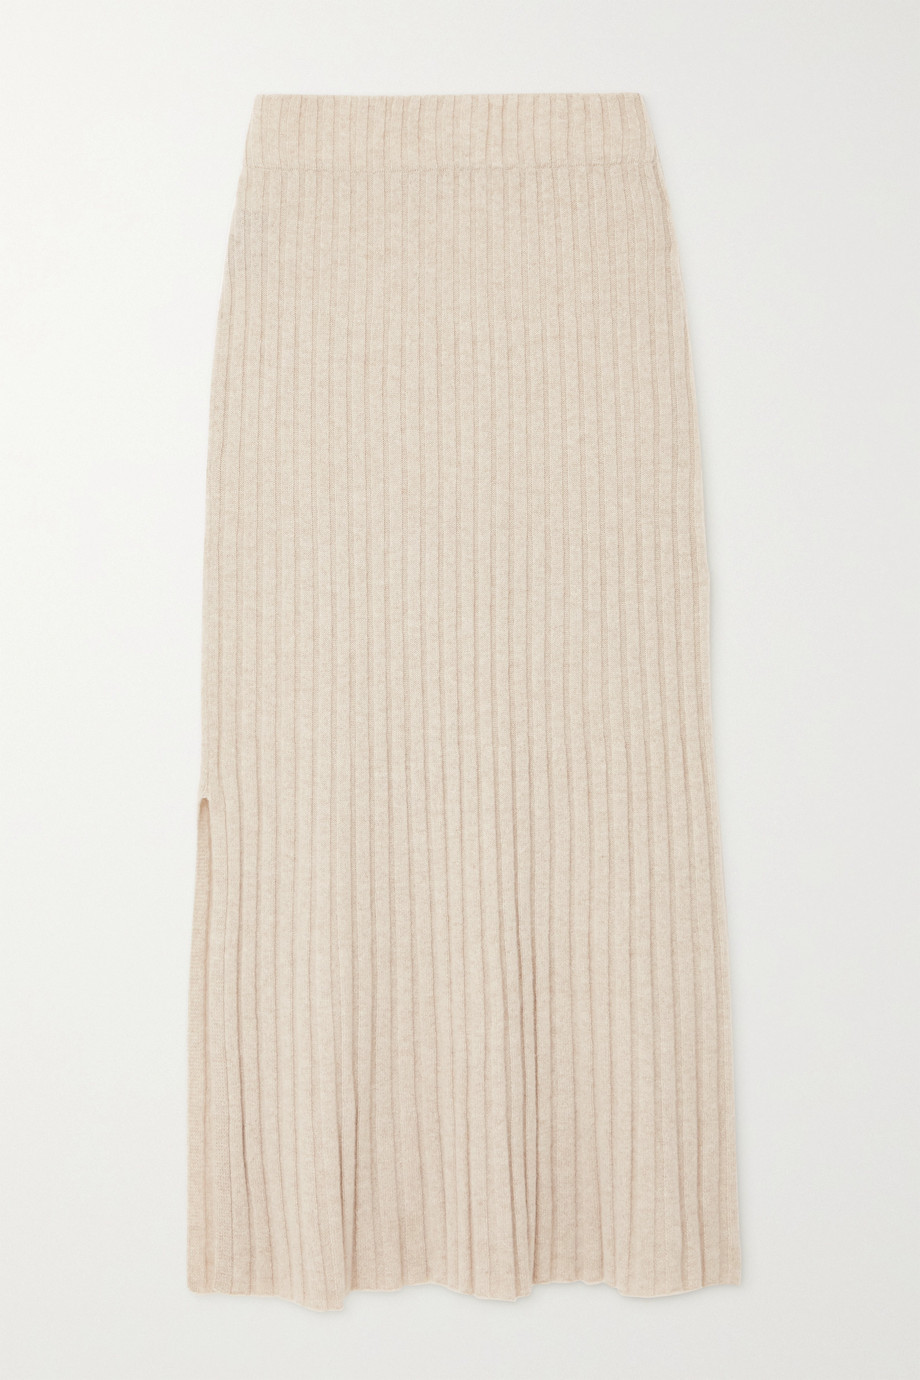 Lisa Yang Celine ribbed cashmere midi skirt